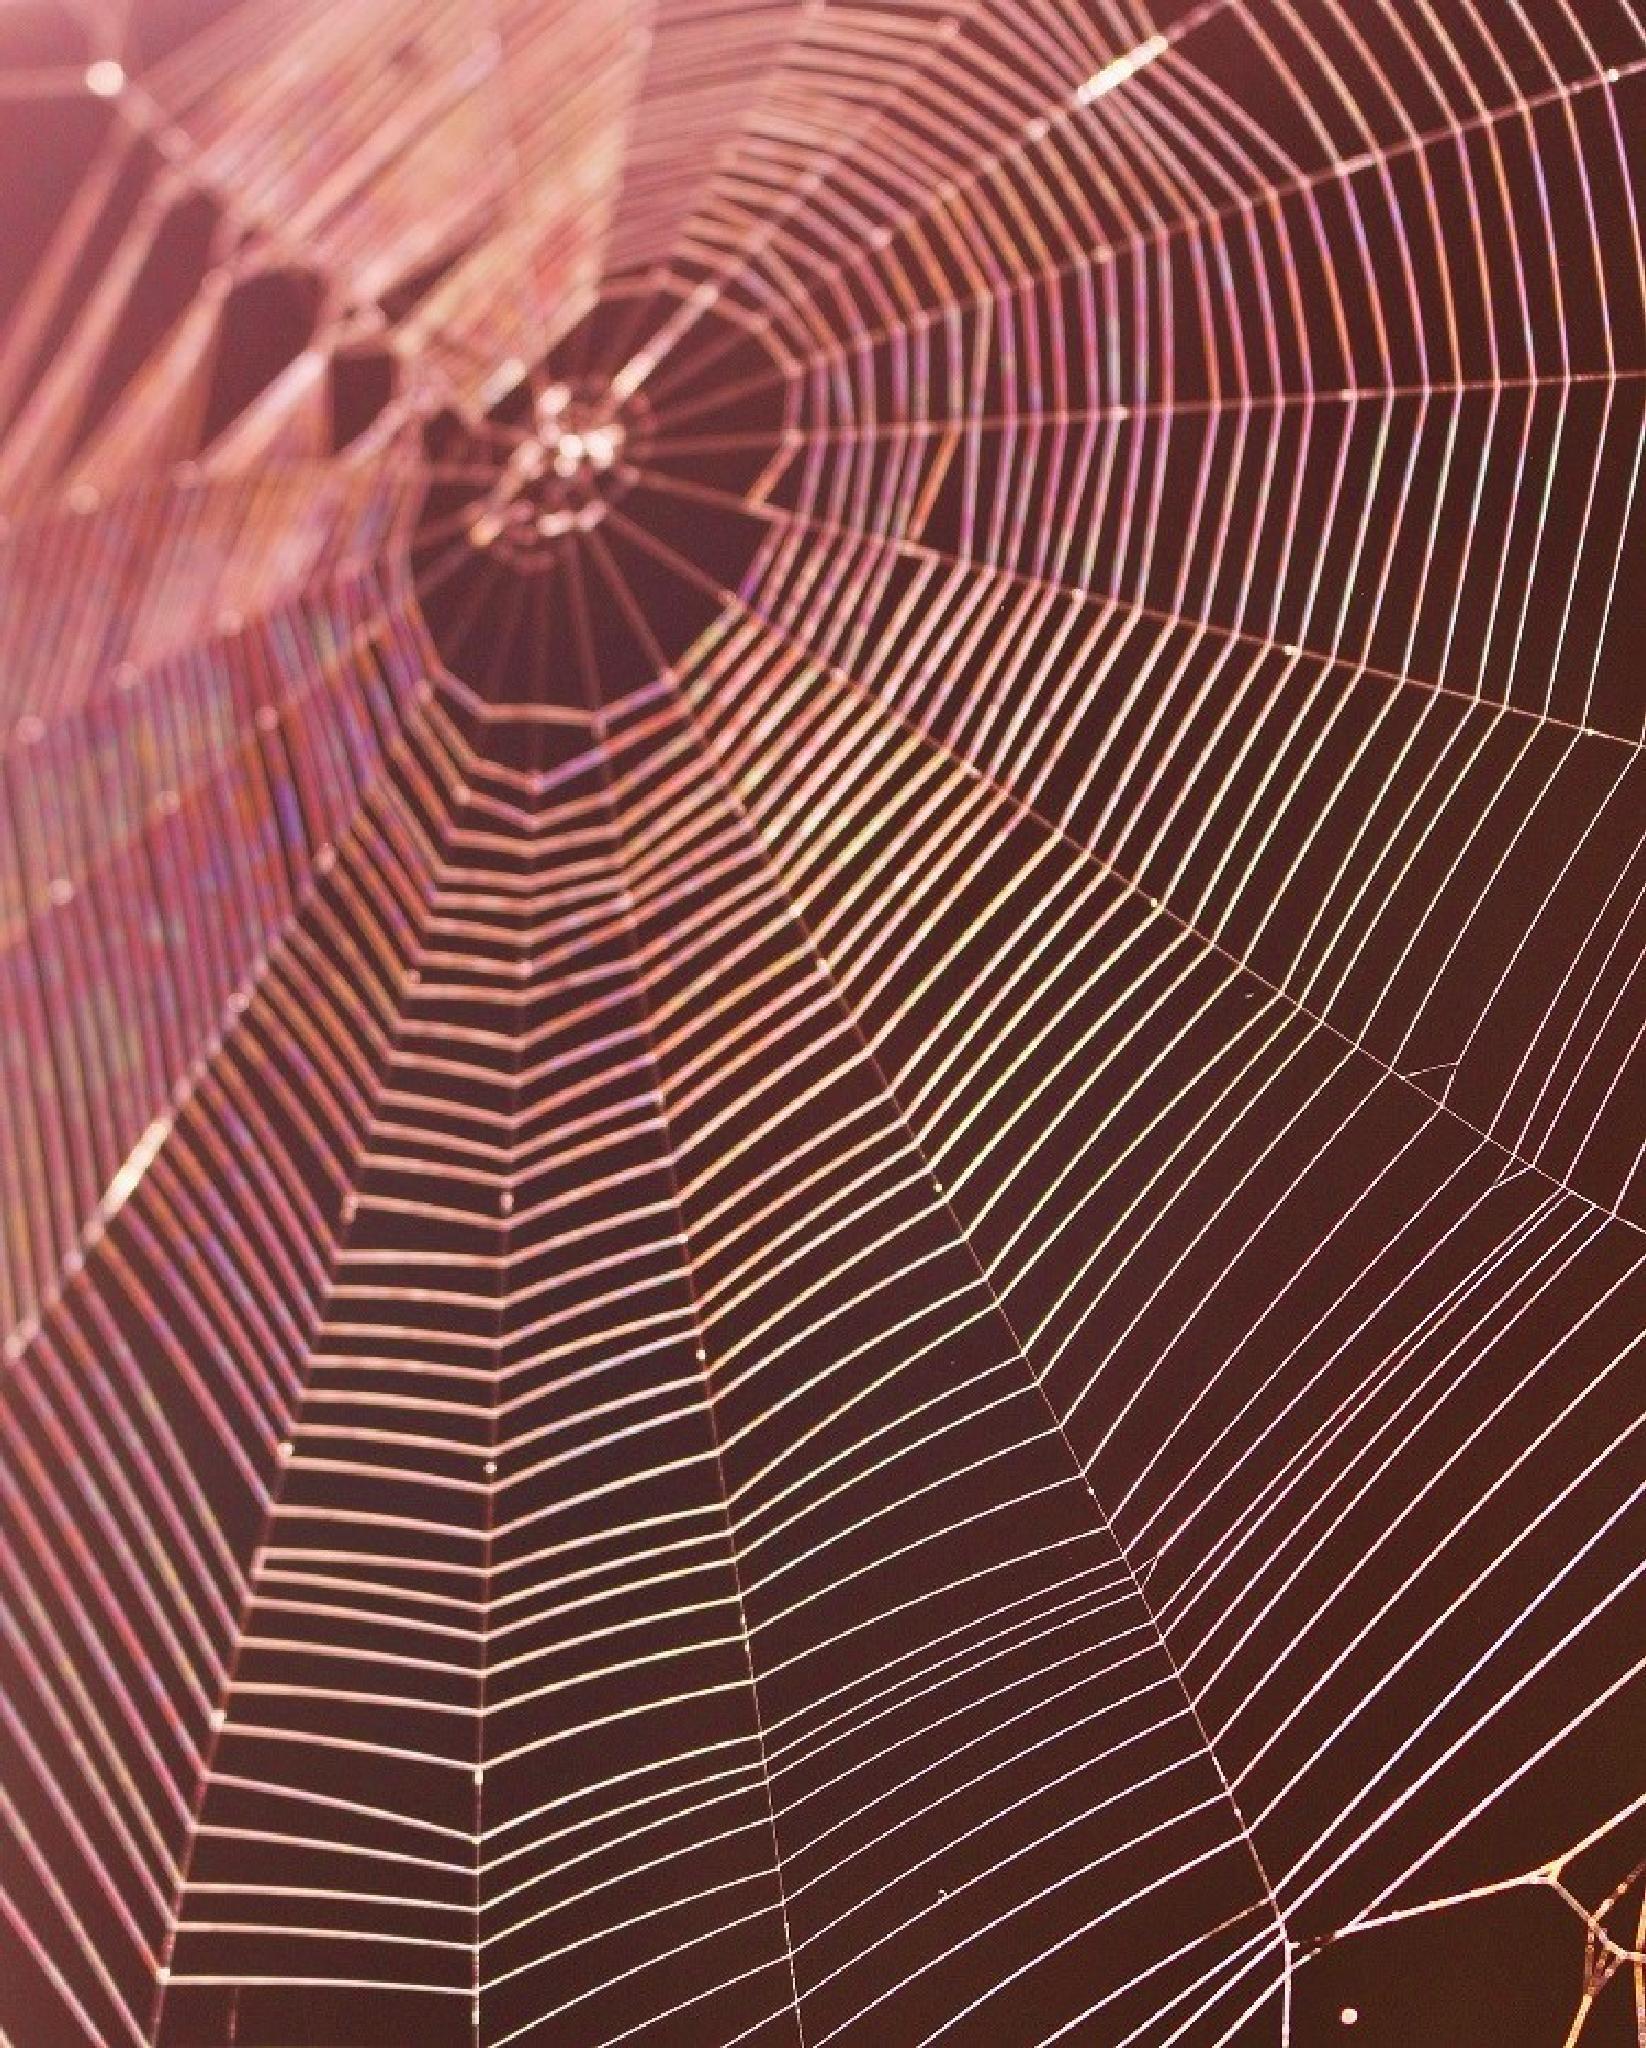 Spiderweb by wanda.nelson.562